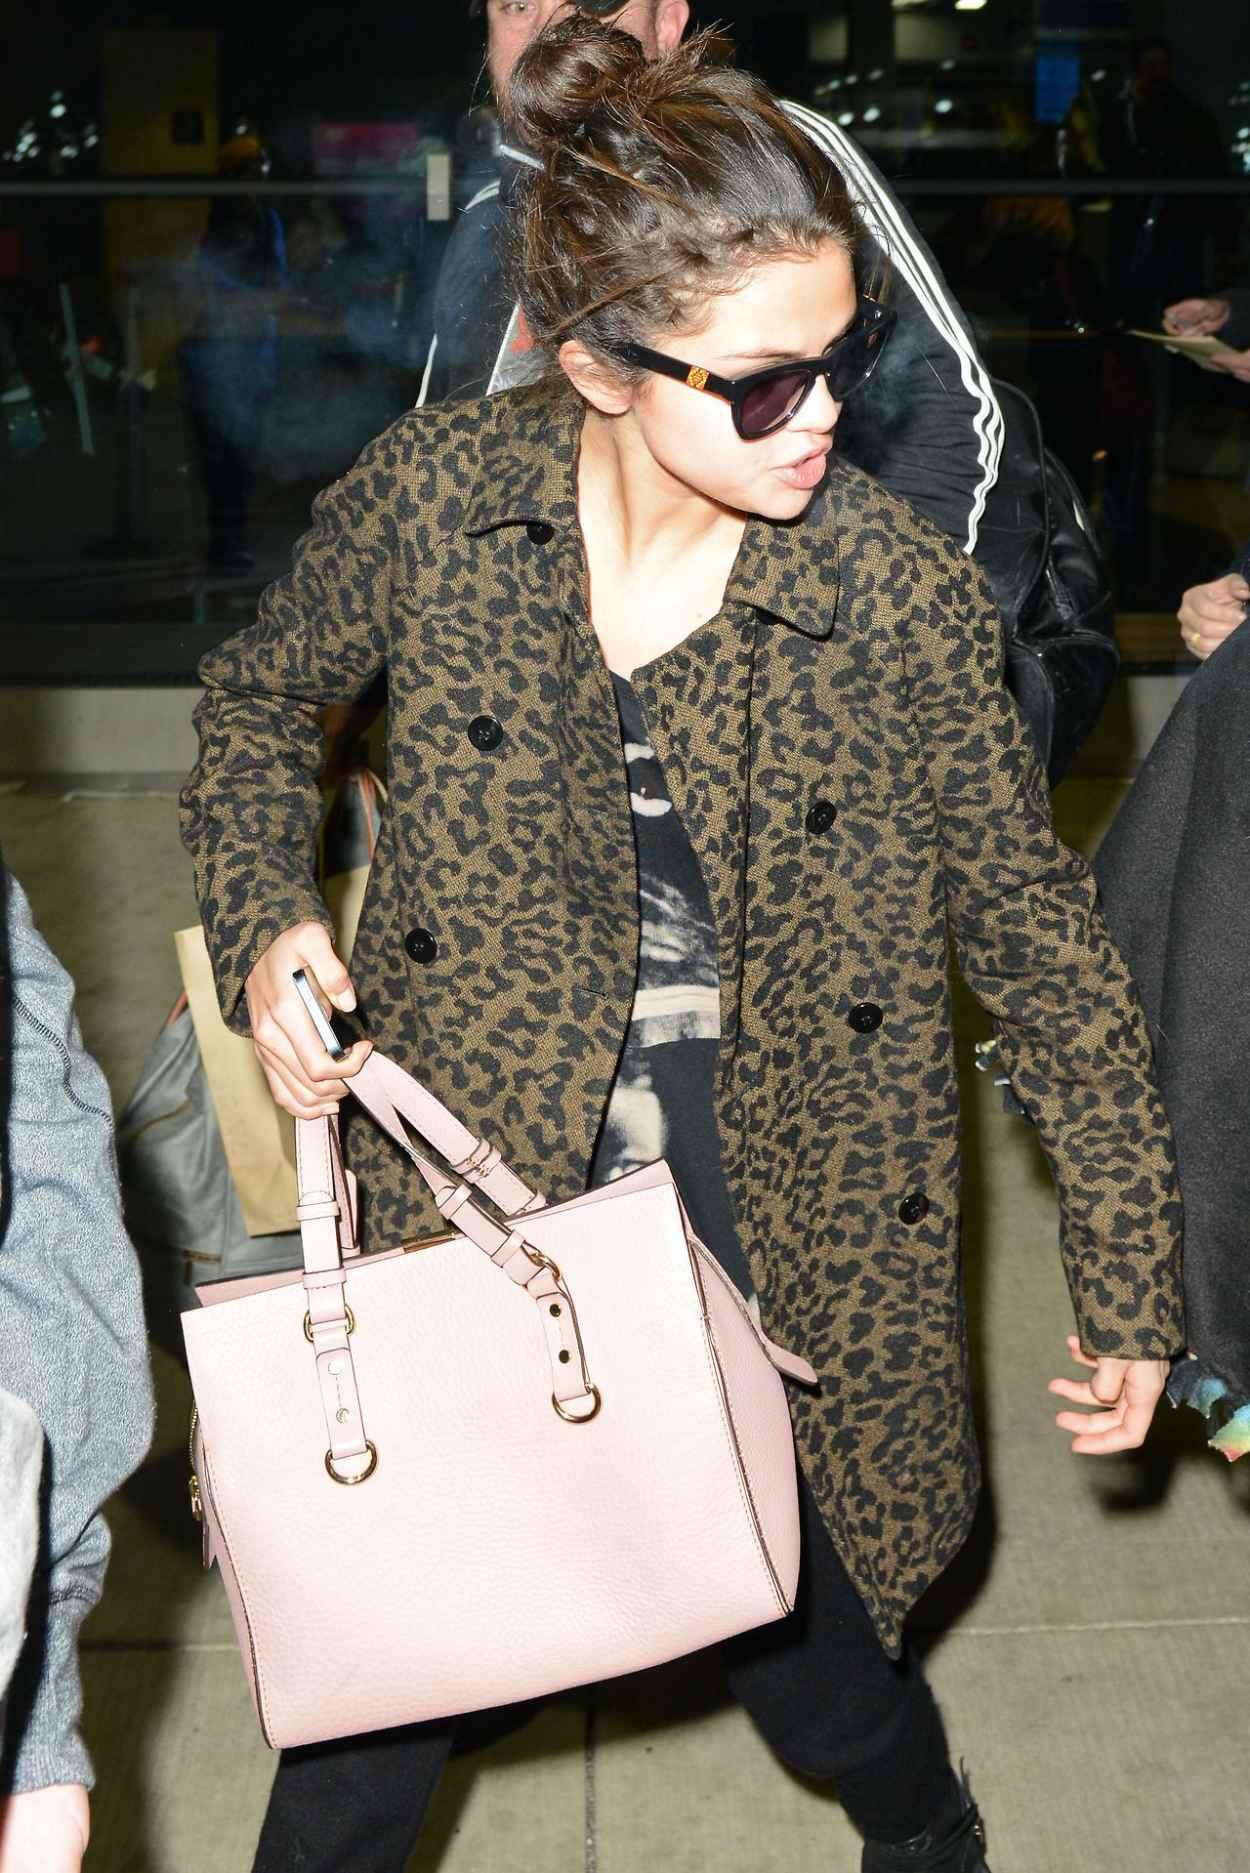 Selena Gomez Street Style - Arriving in Chicago - December 2015-1